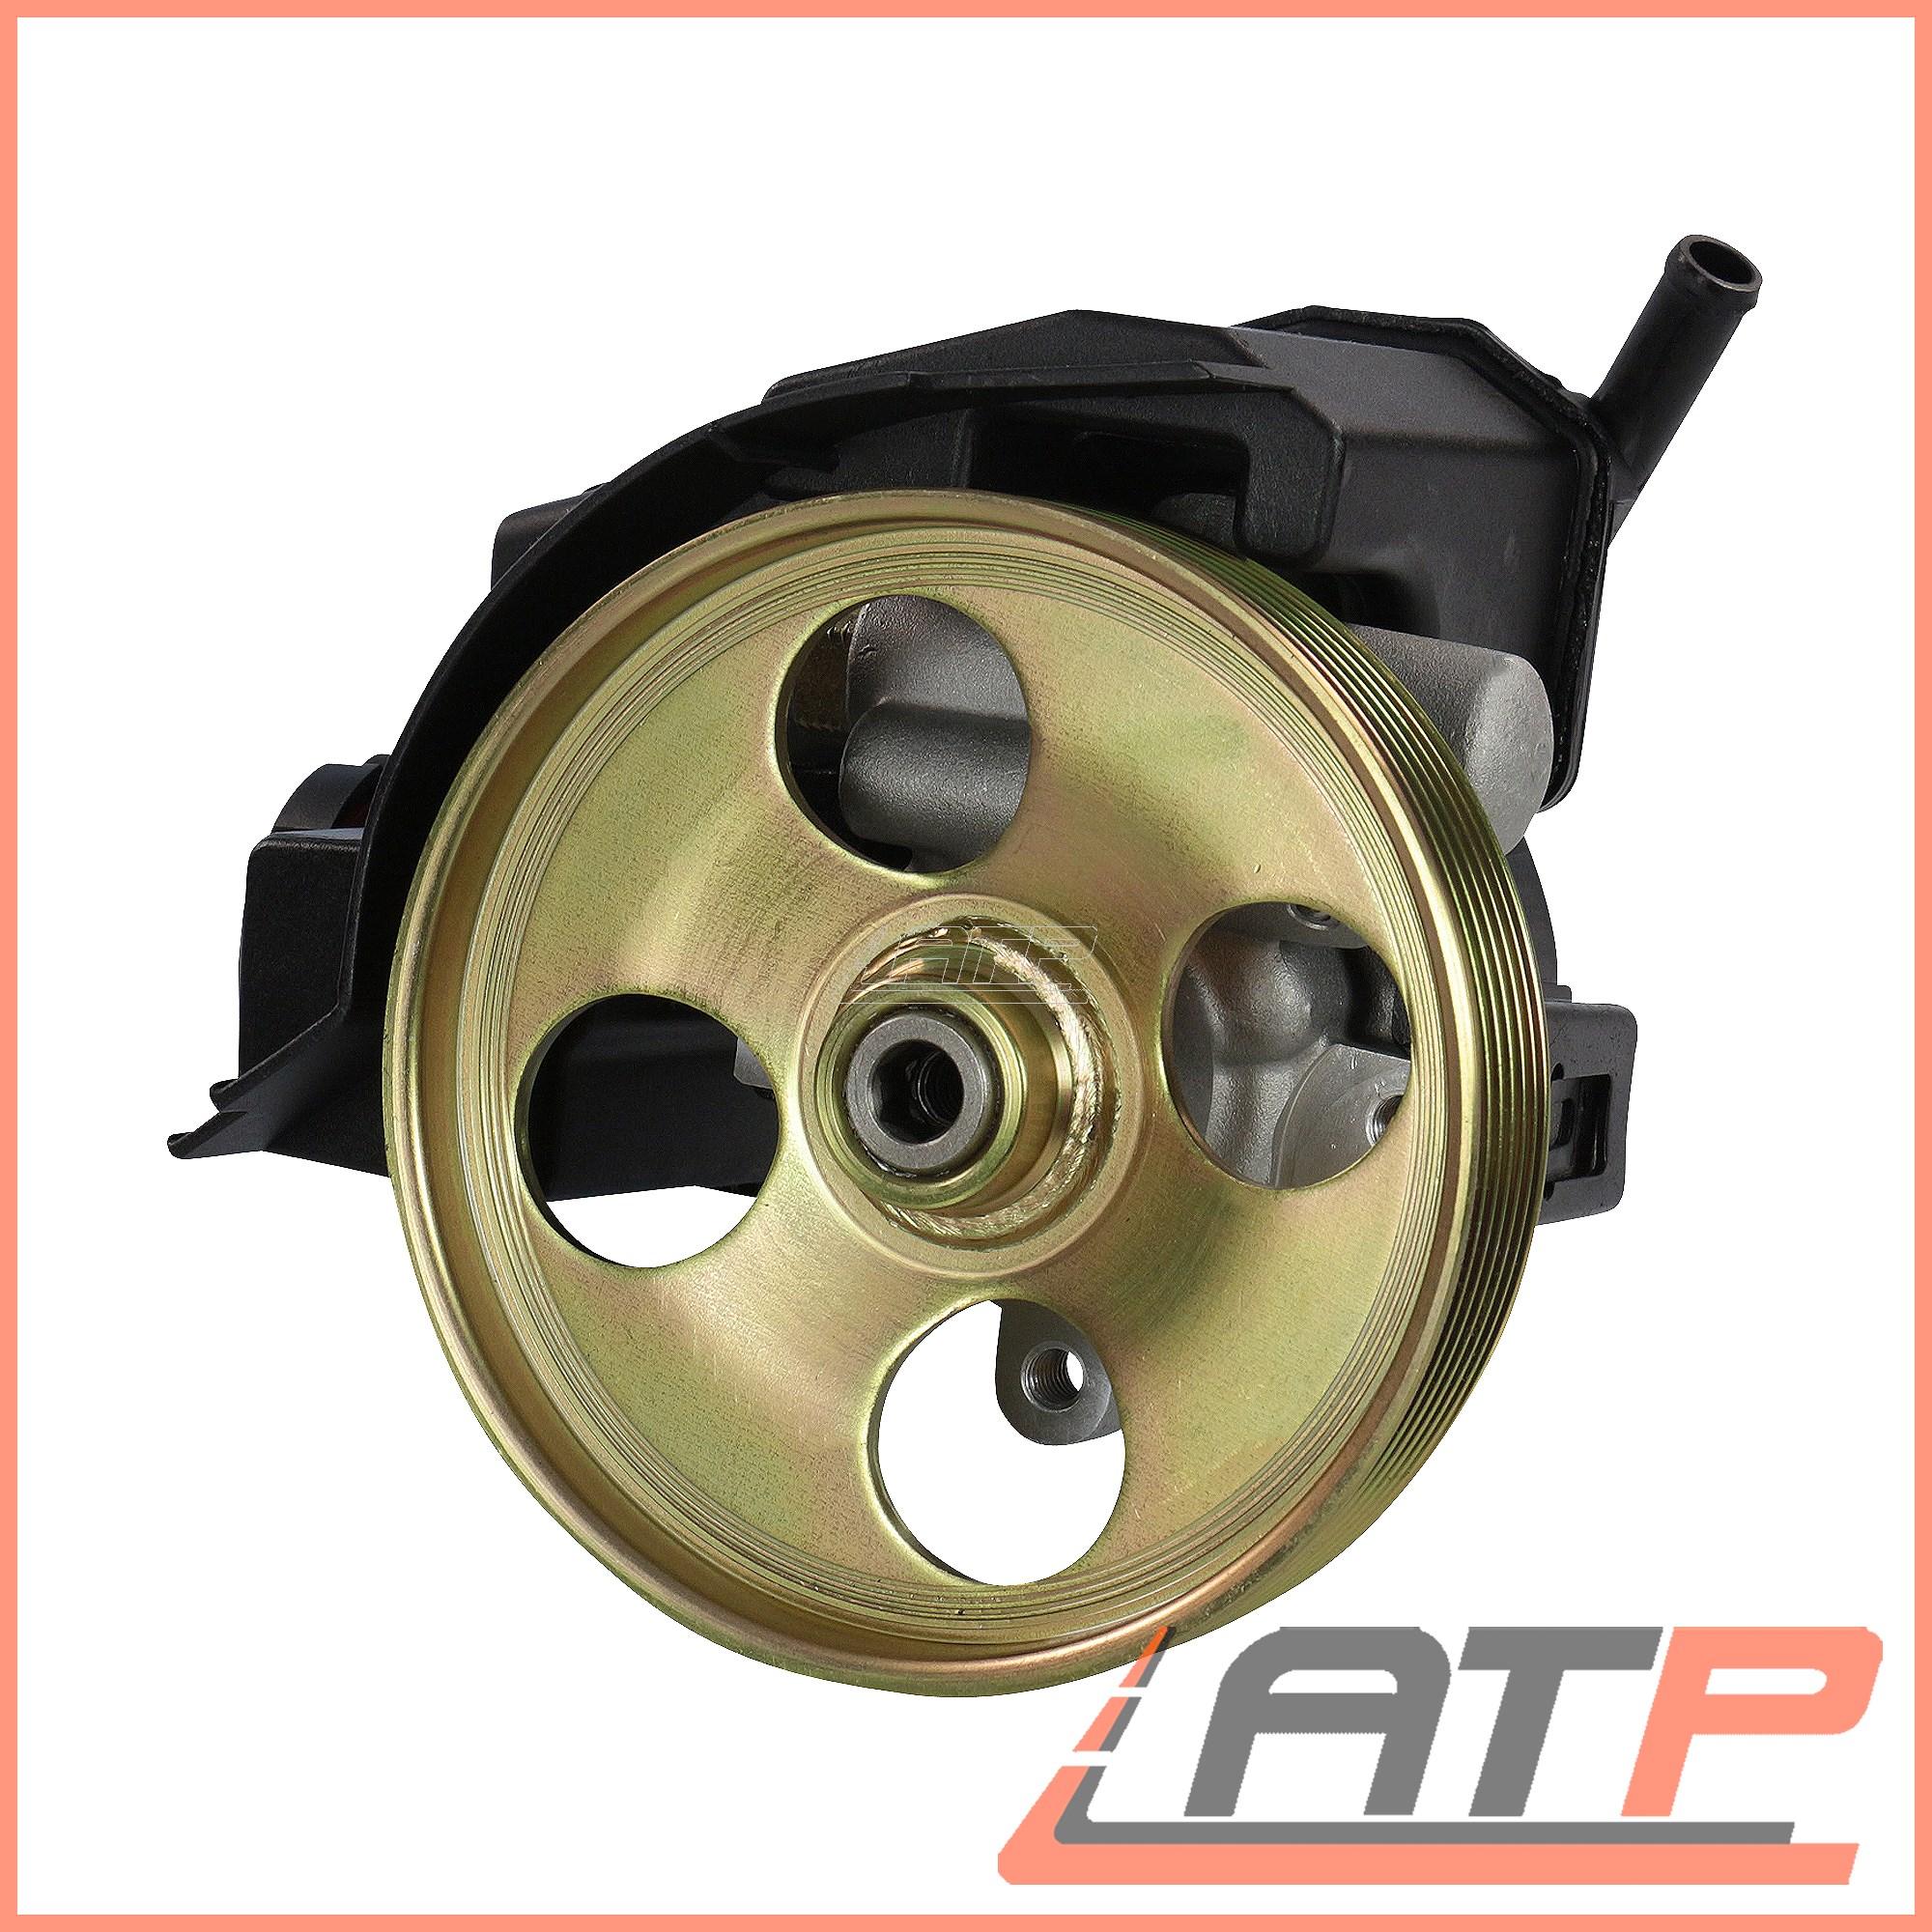 POWER STEERING PUMP HYDRAULIC CITROEN C2 1 4 1 6 BJ 03-07 | eBay